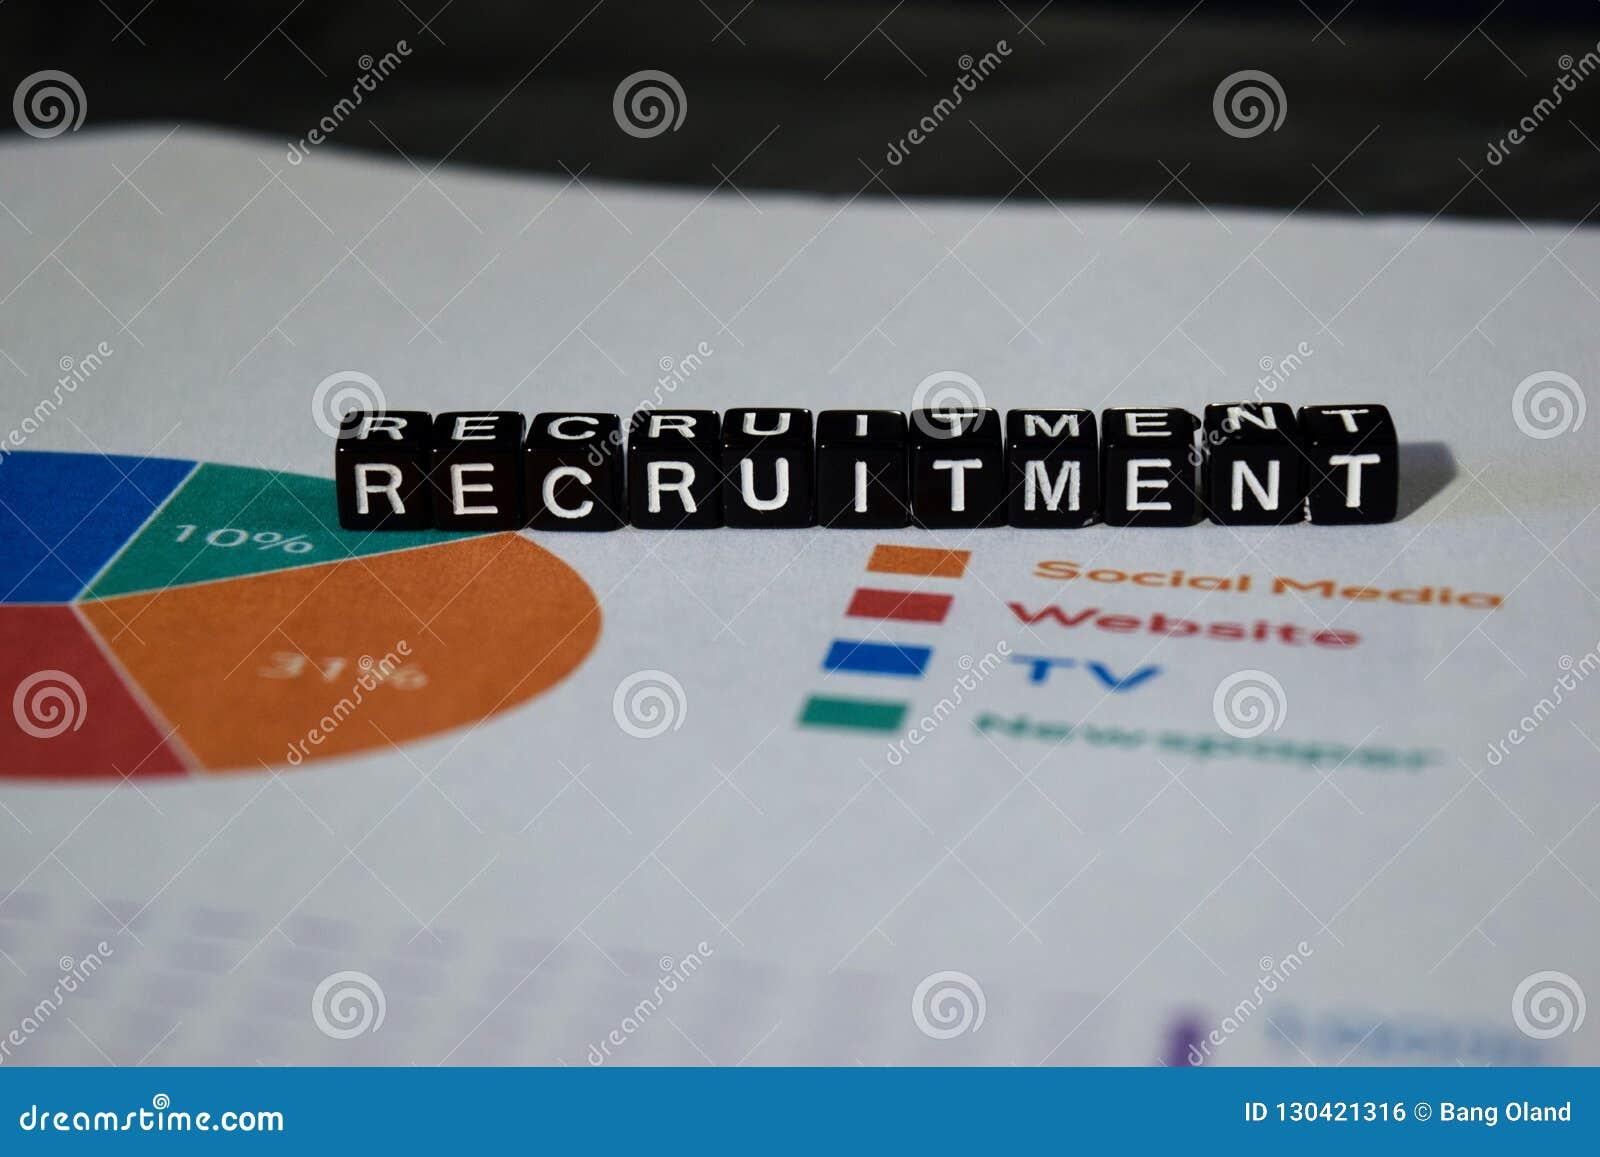 Recruitment on wooden blocks. Job Work Vacancy Search Concept